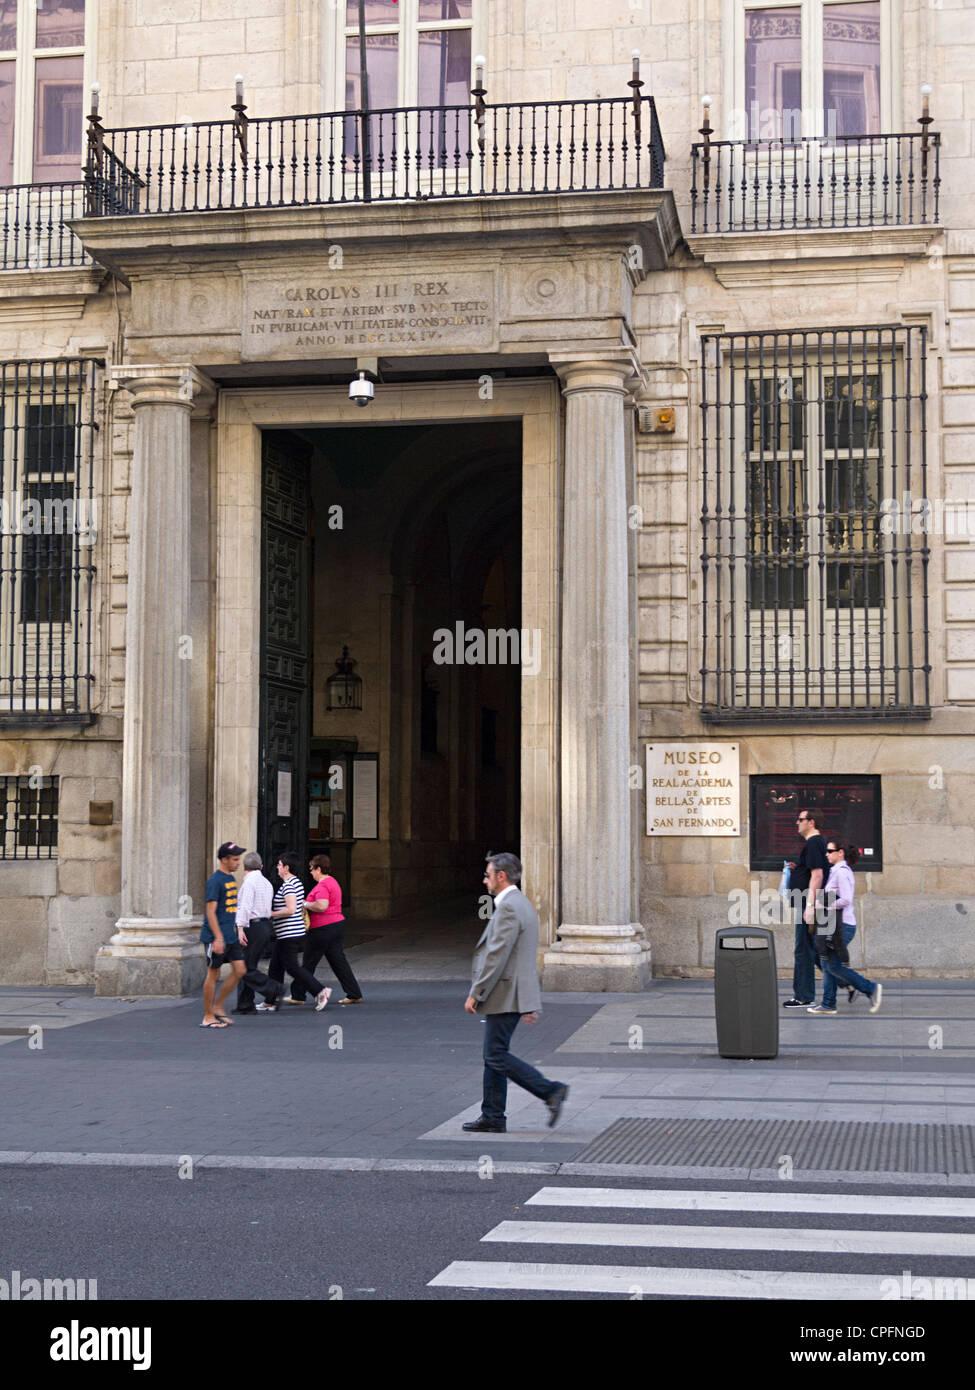 Real Academia de Bellas Artes (fine arts museum and gallery), Madrid, Spain, Europe - Stock Image